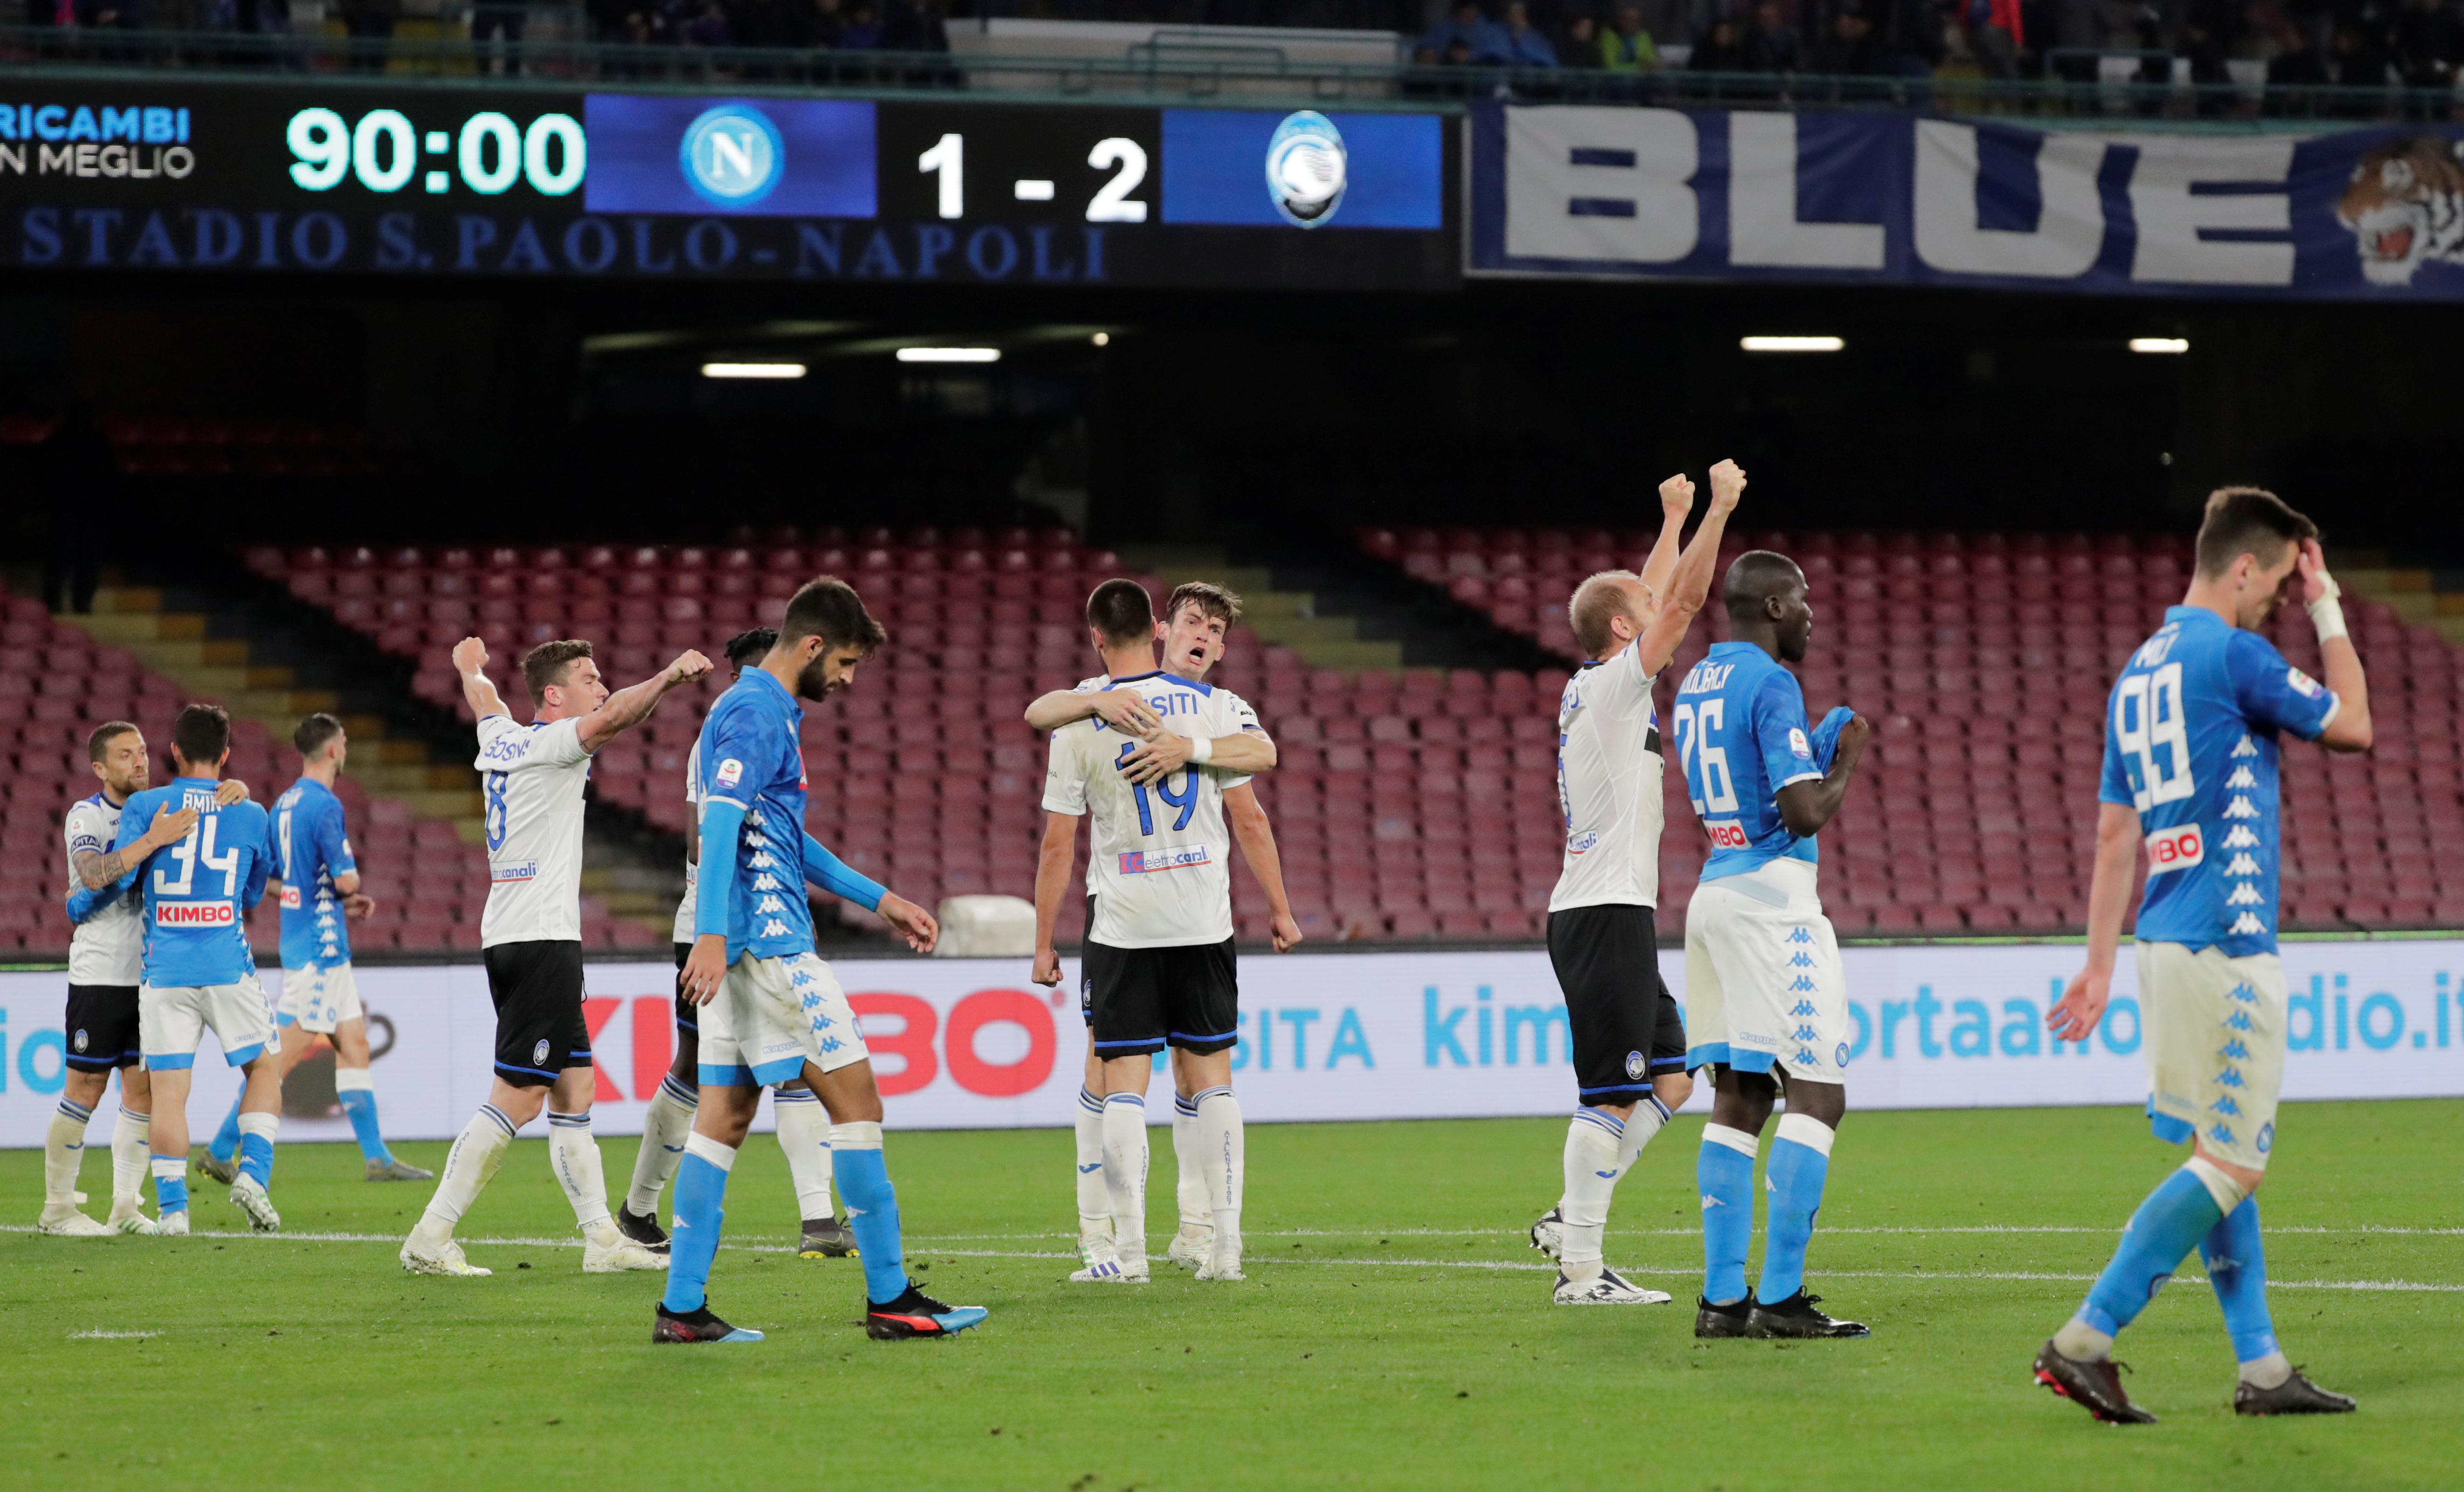 Soccer: Atalanta sink Napoli to move closer to top four finish